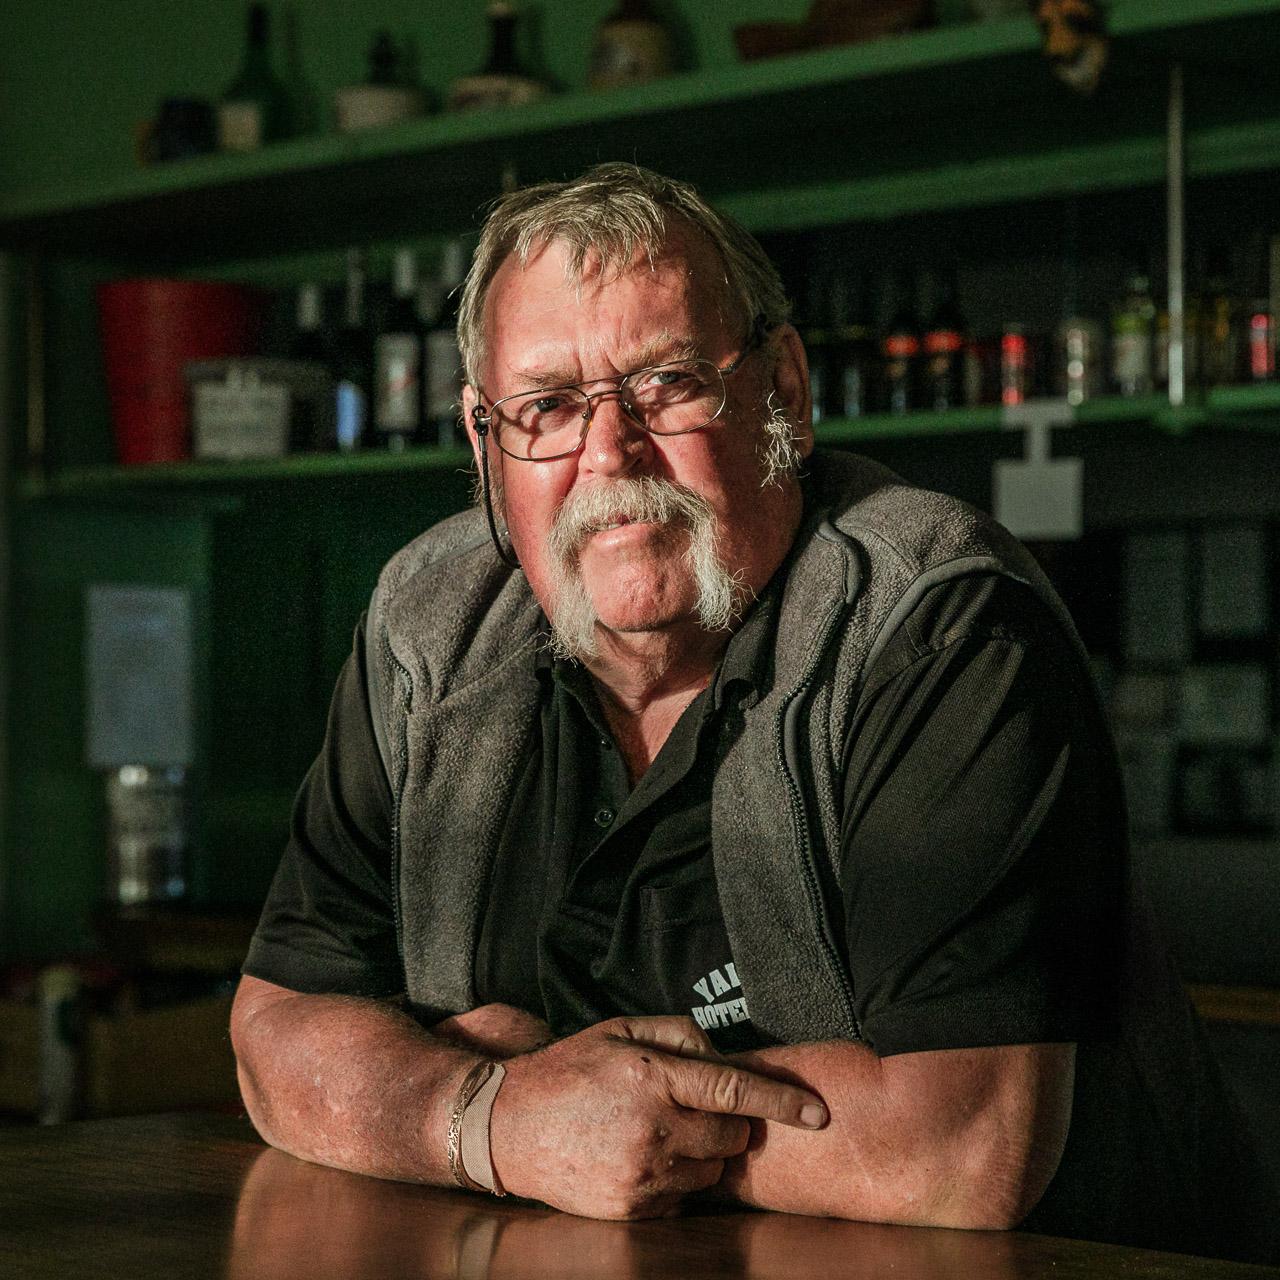 Portrait of a publican in outback Australia